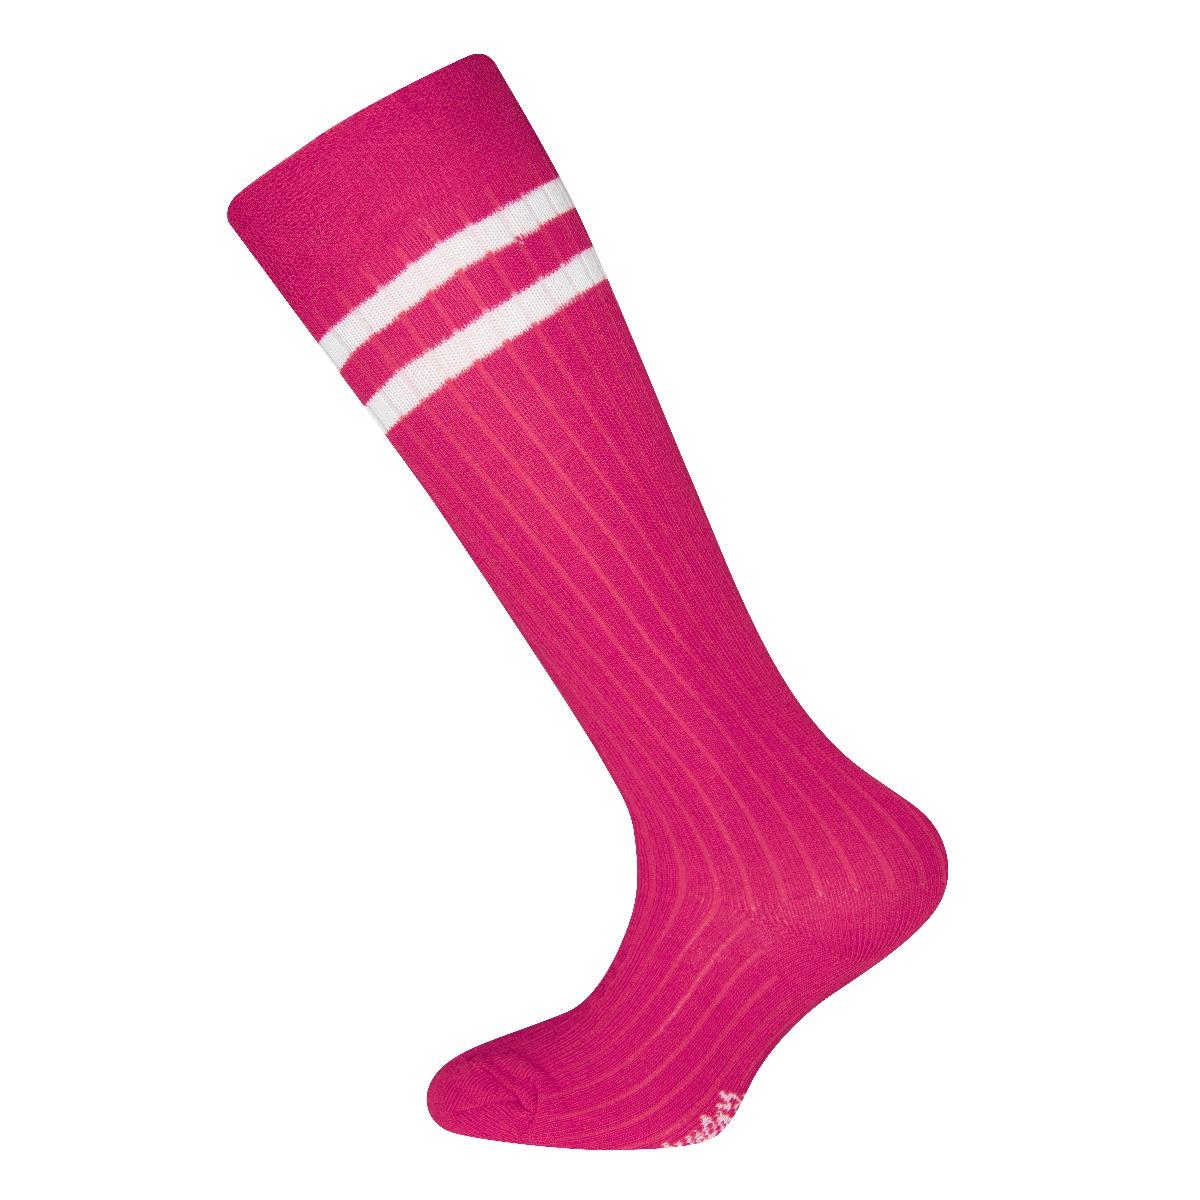 Ewers Kniekousen met rib motief 2 strepen-31/34-Pink